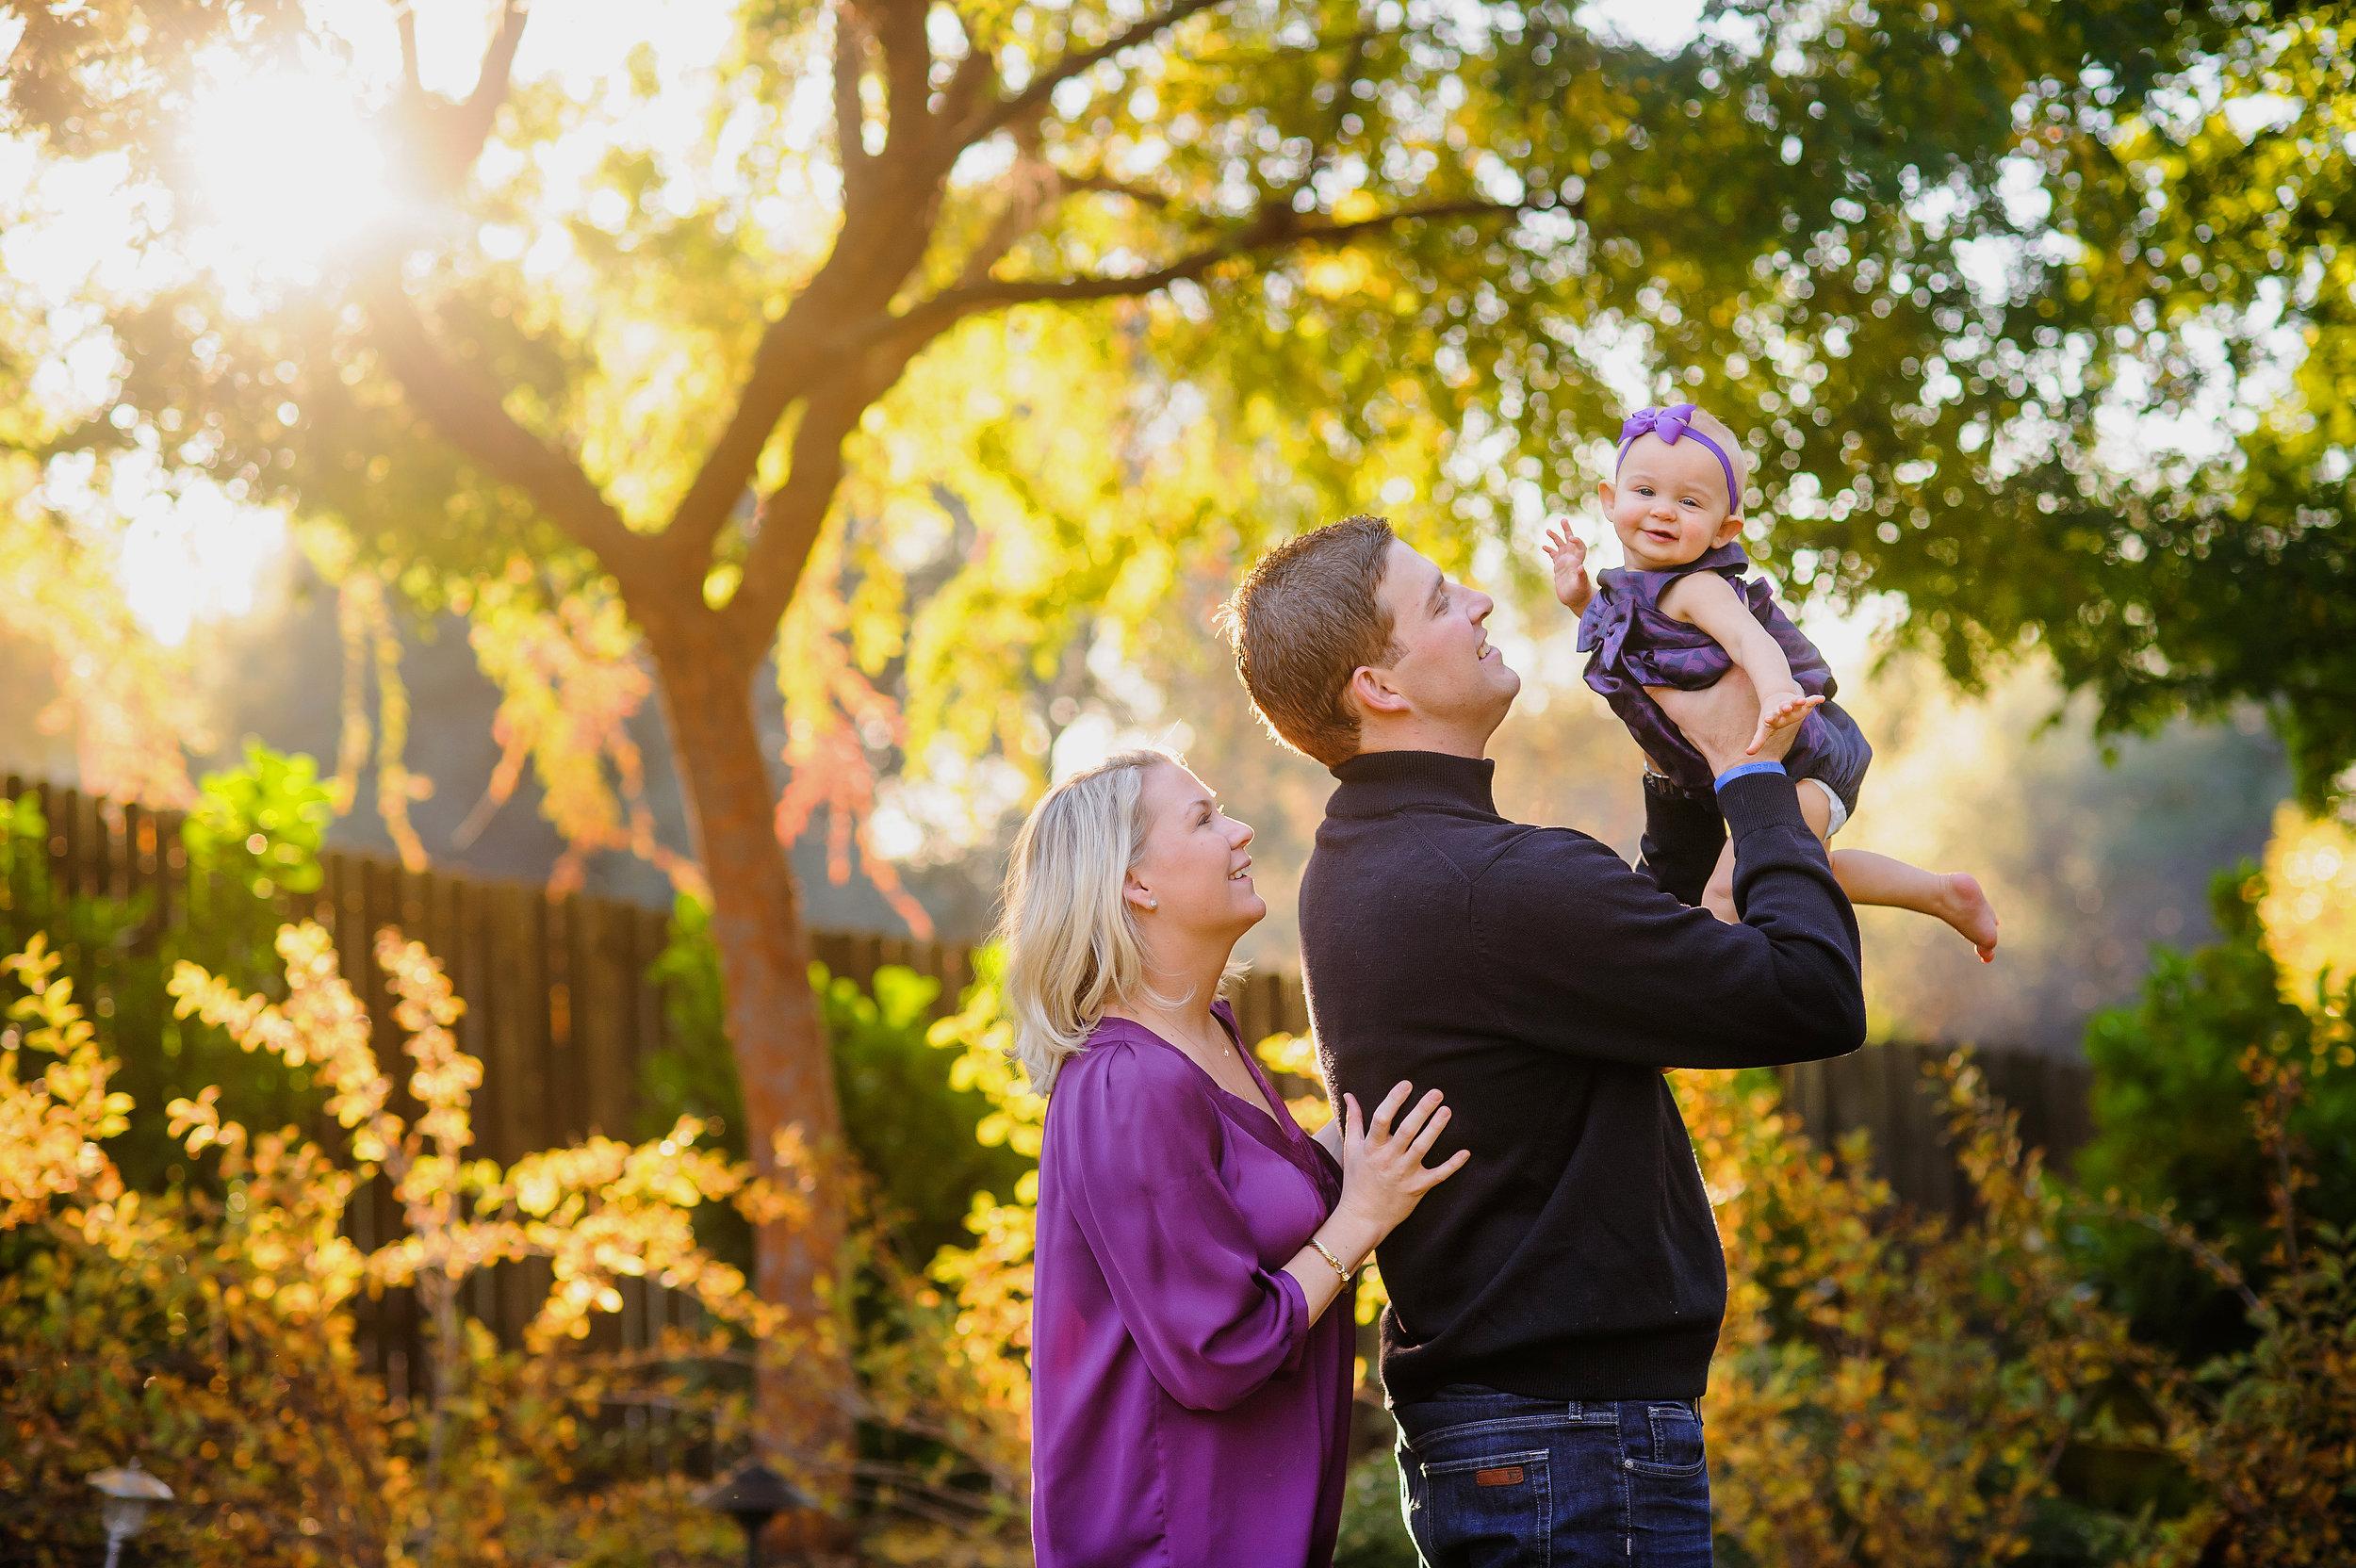 fenstermaker-family-112-sacramento-family-photographer-katherine-nicole-photography.JPG